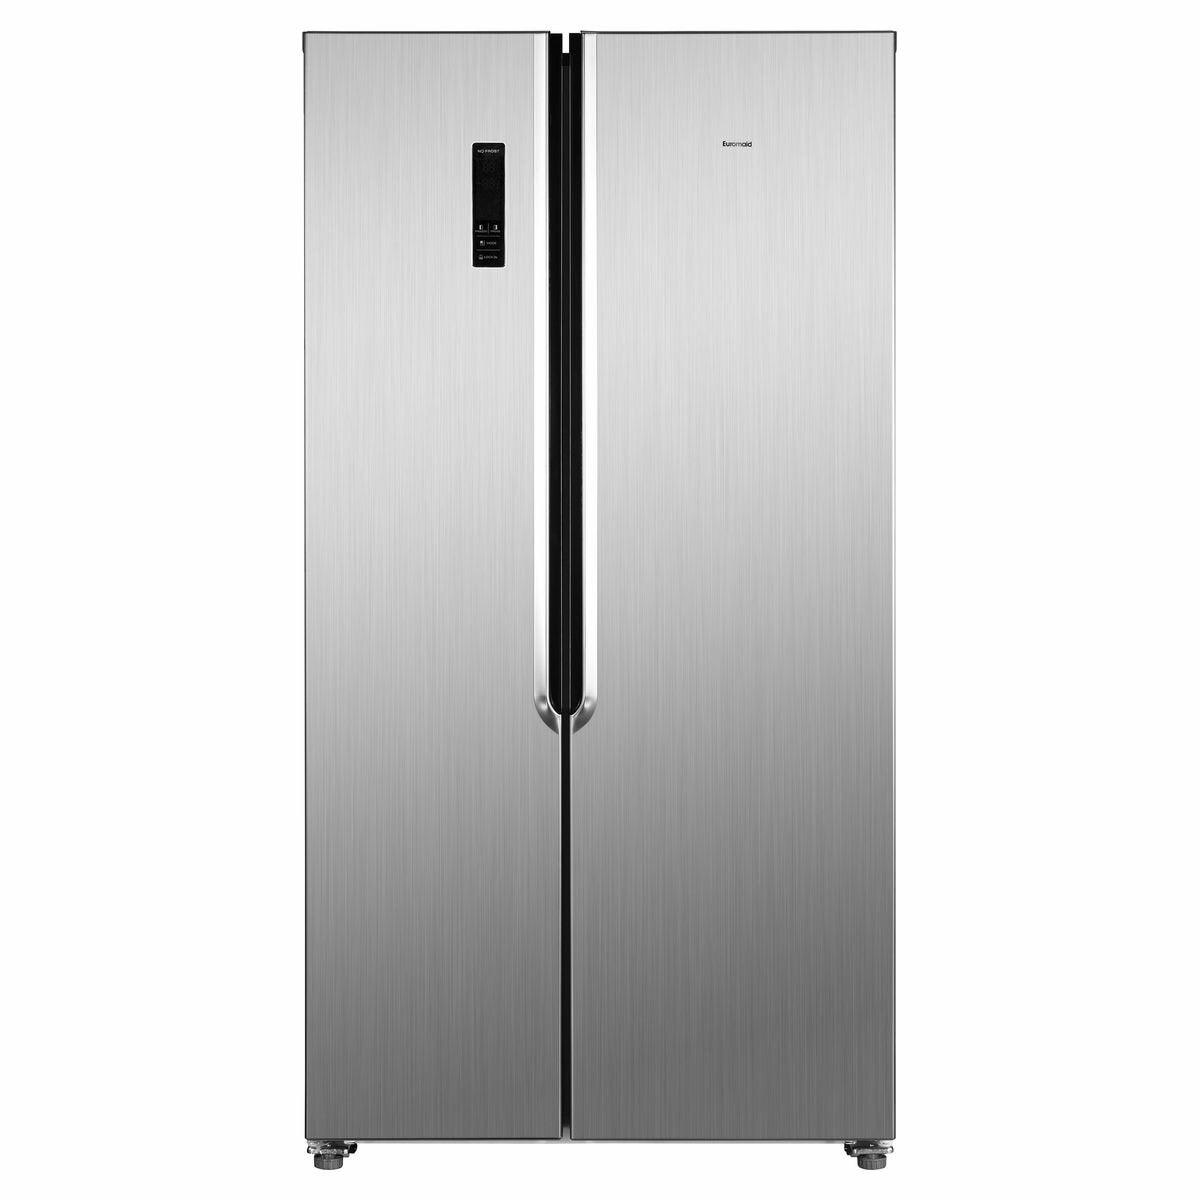 Euromaid ESBS563S Refrigerator